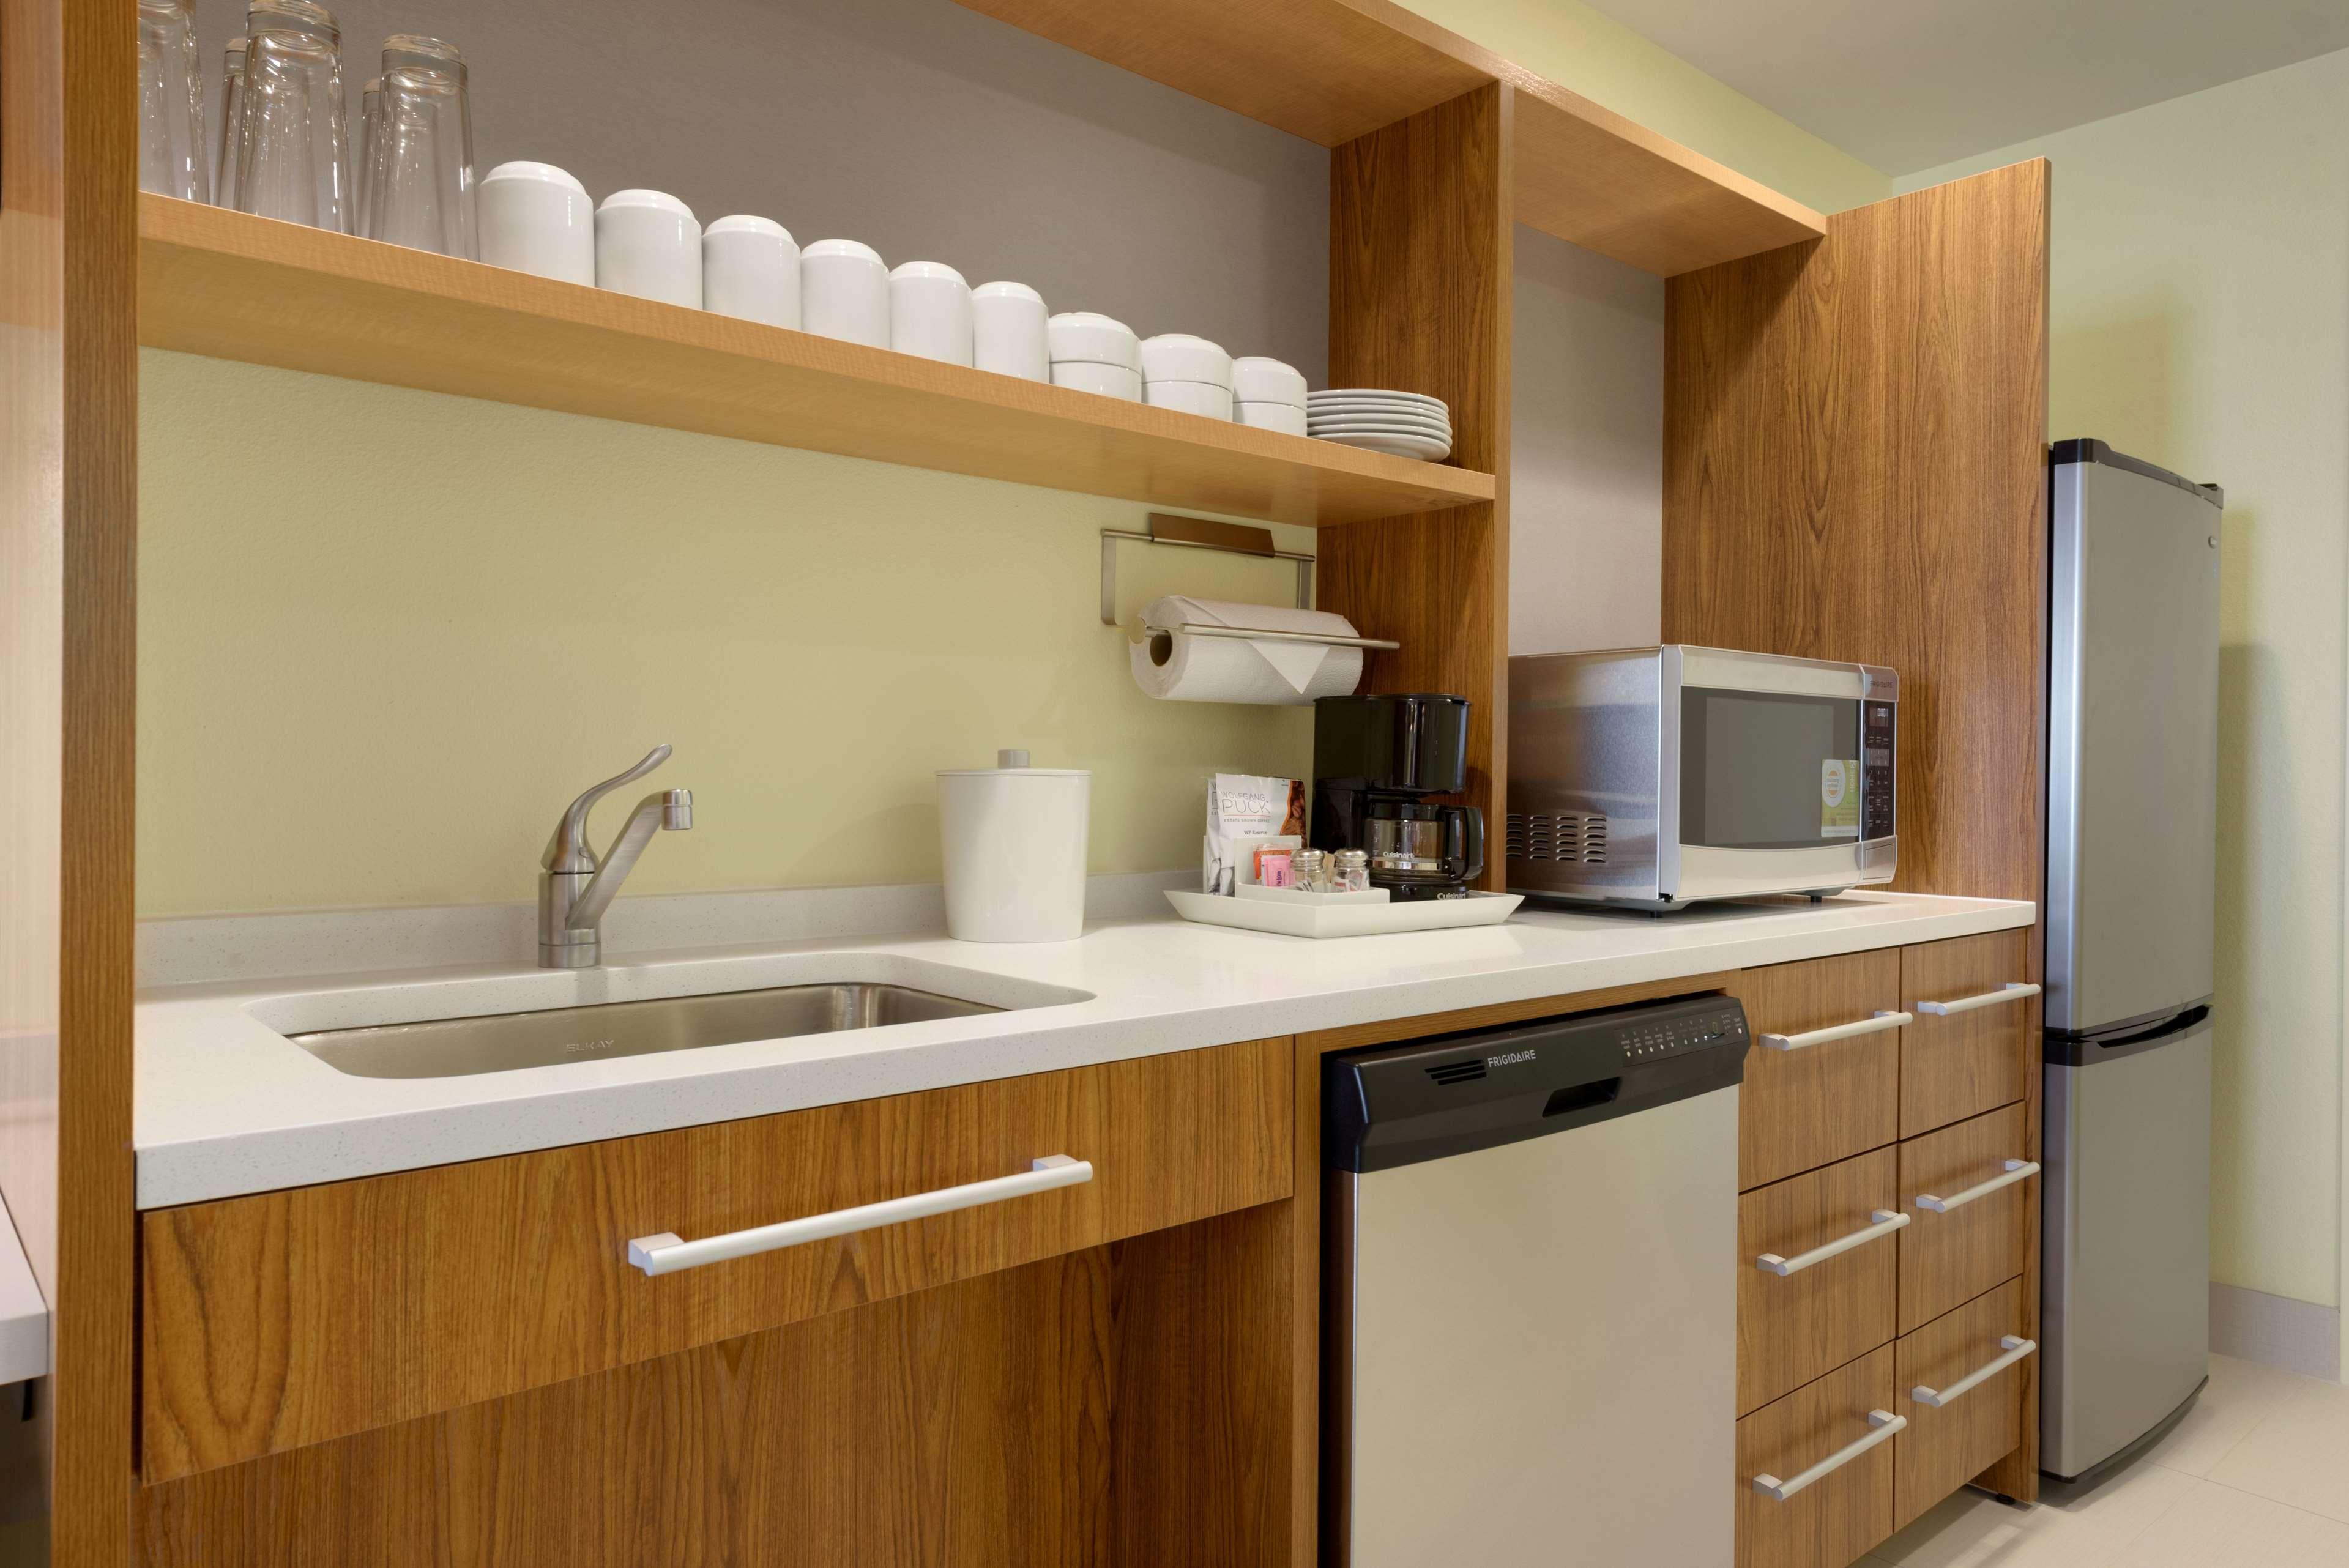 Home2 Suites by Hilton Roseville Minneapolis image 4